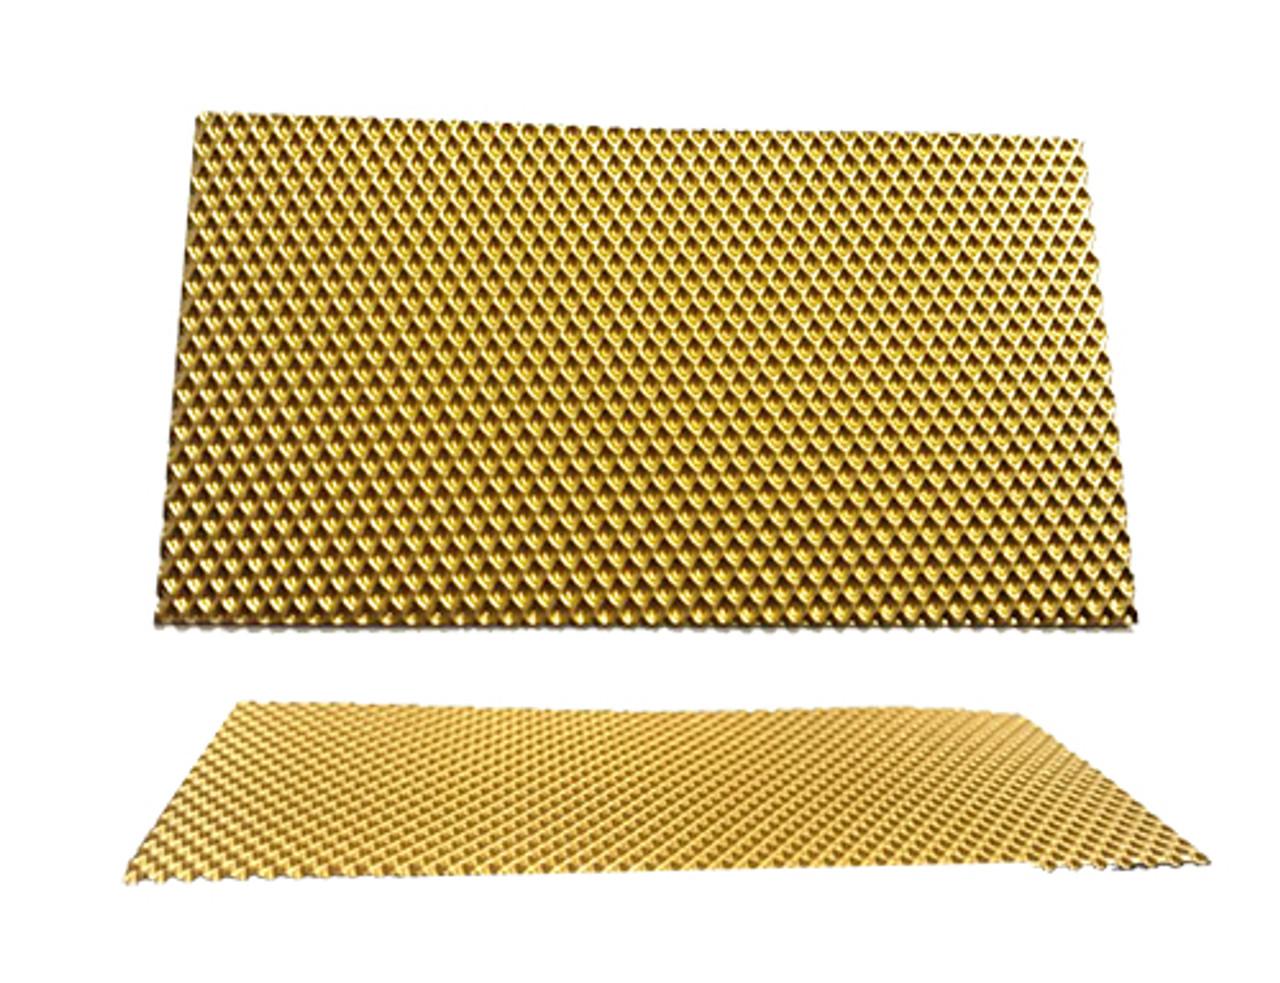 Aluminum Foil - Gold